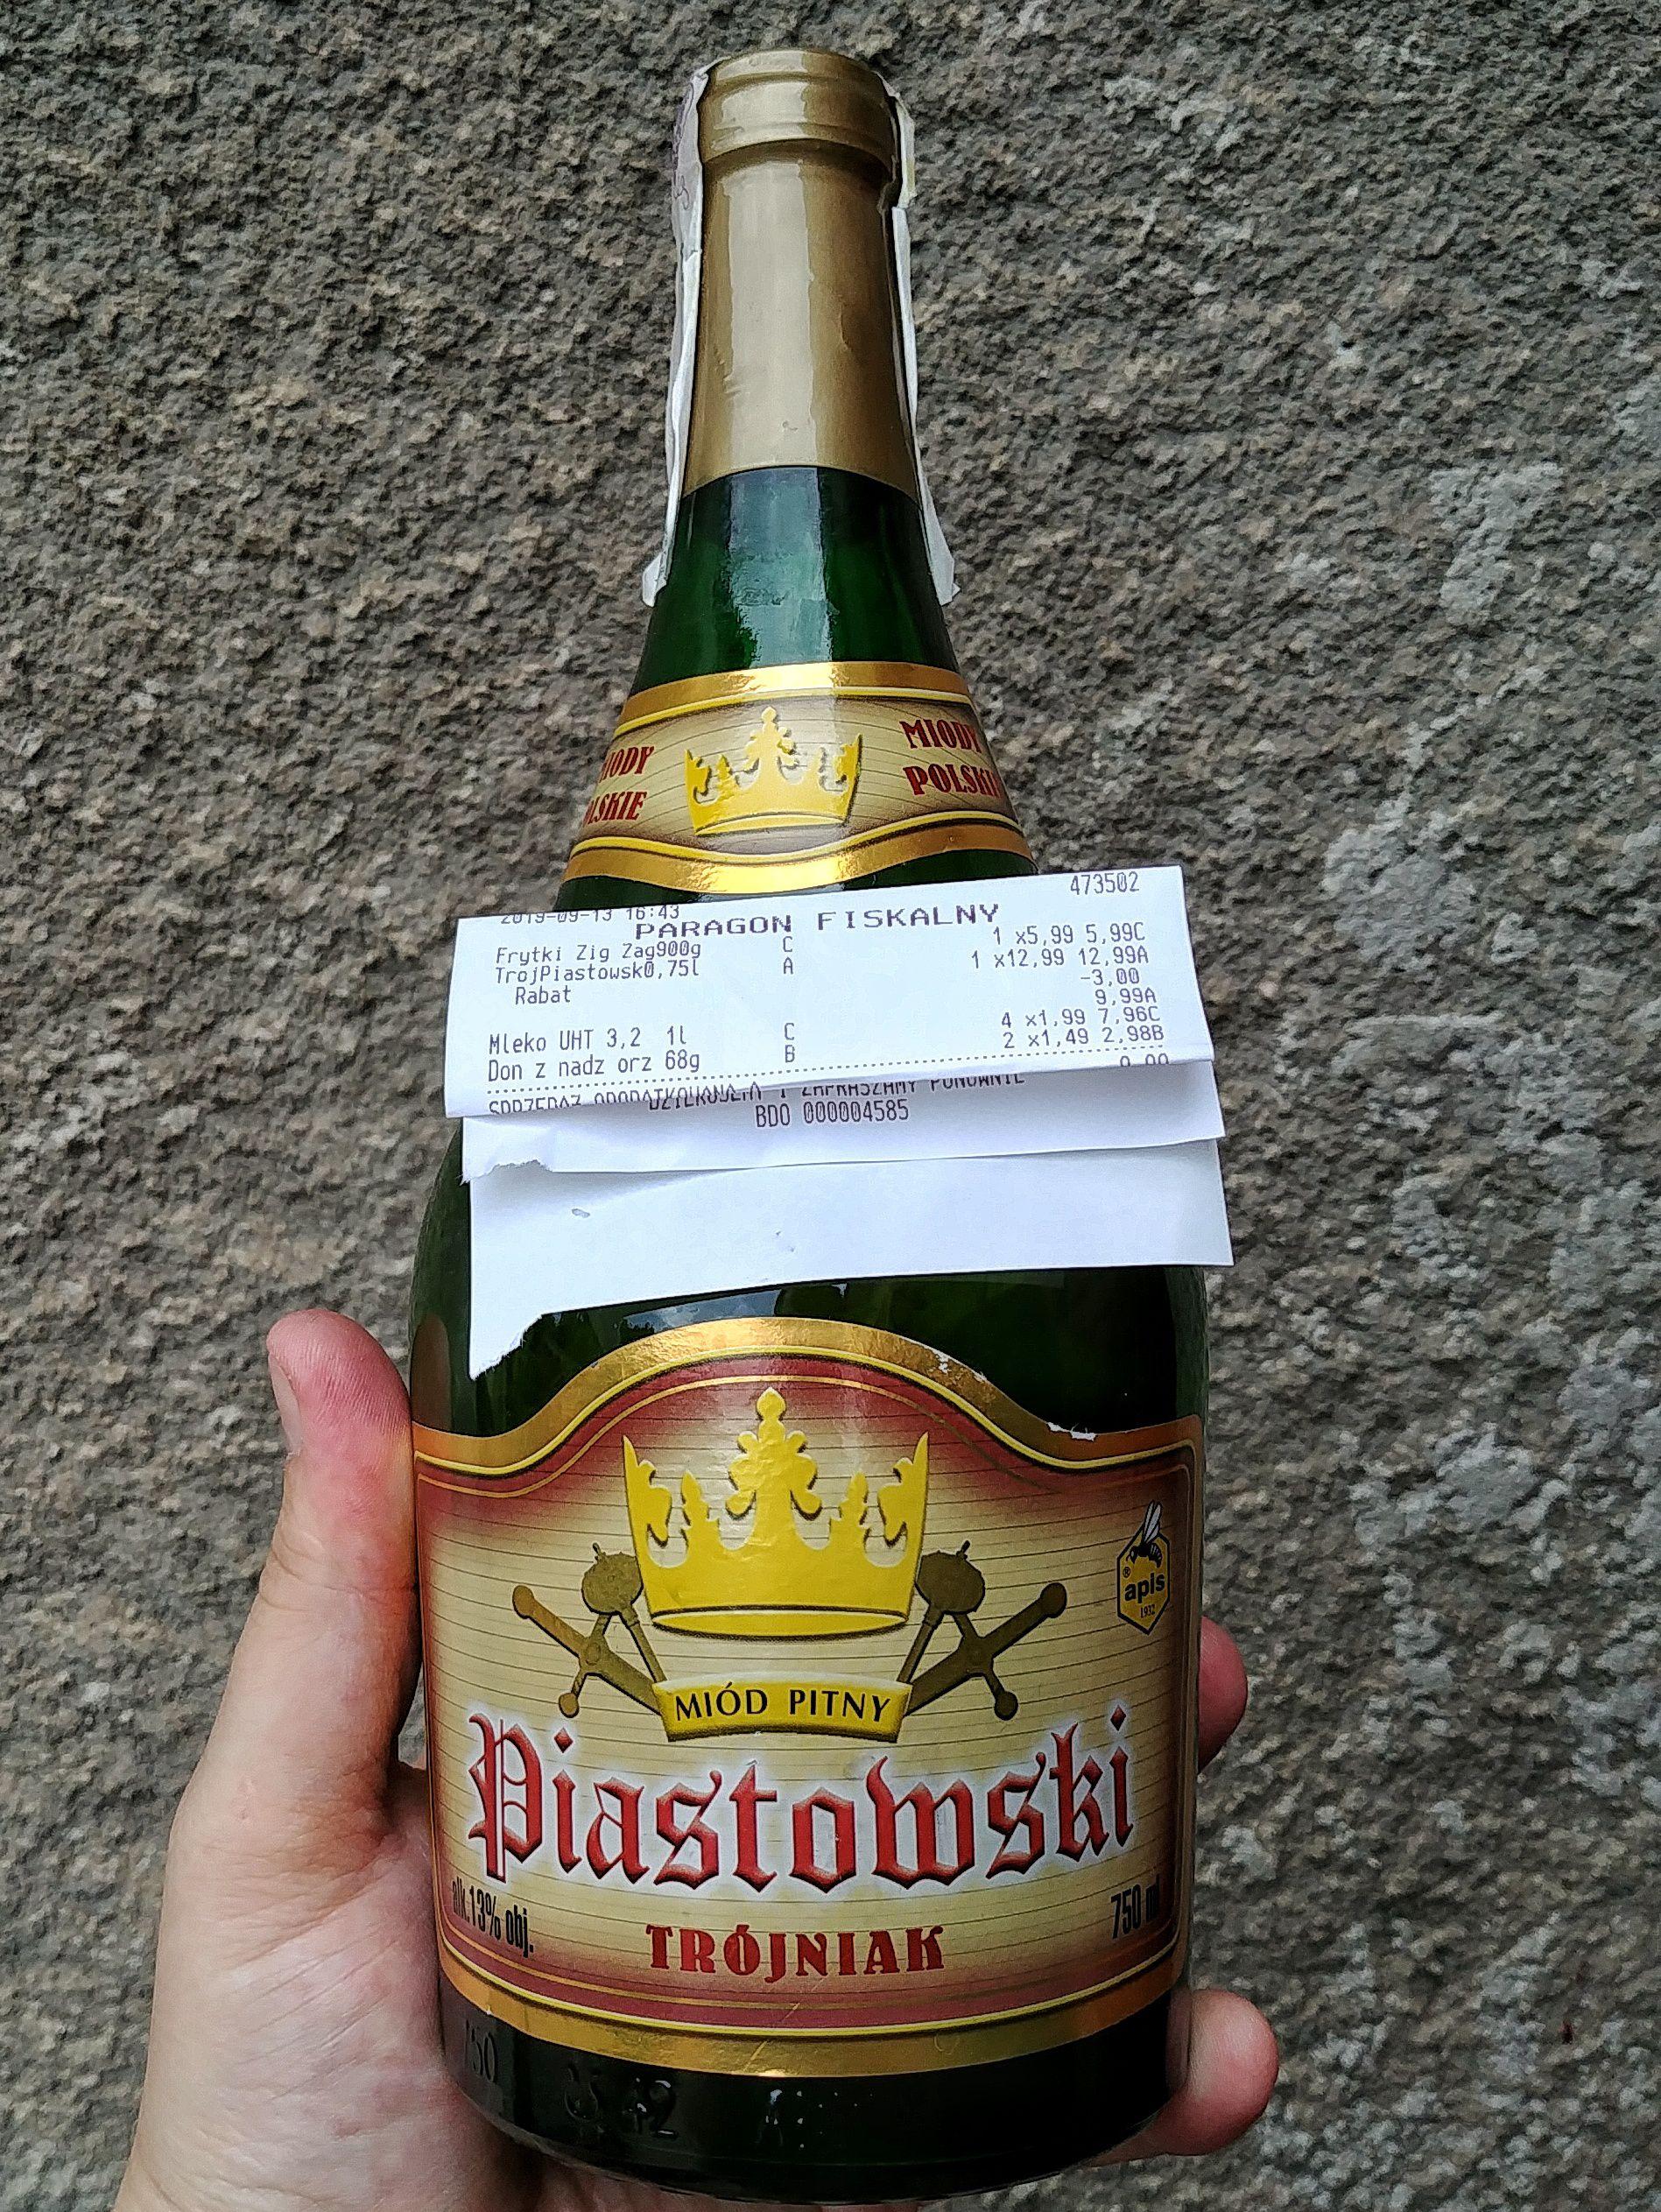 Miód pitny Trójniak Piastowski 0.75L 13% (Biedronka)